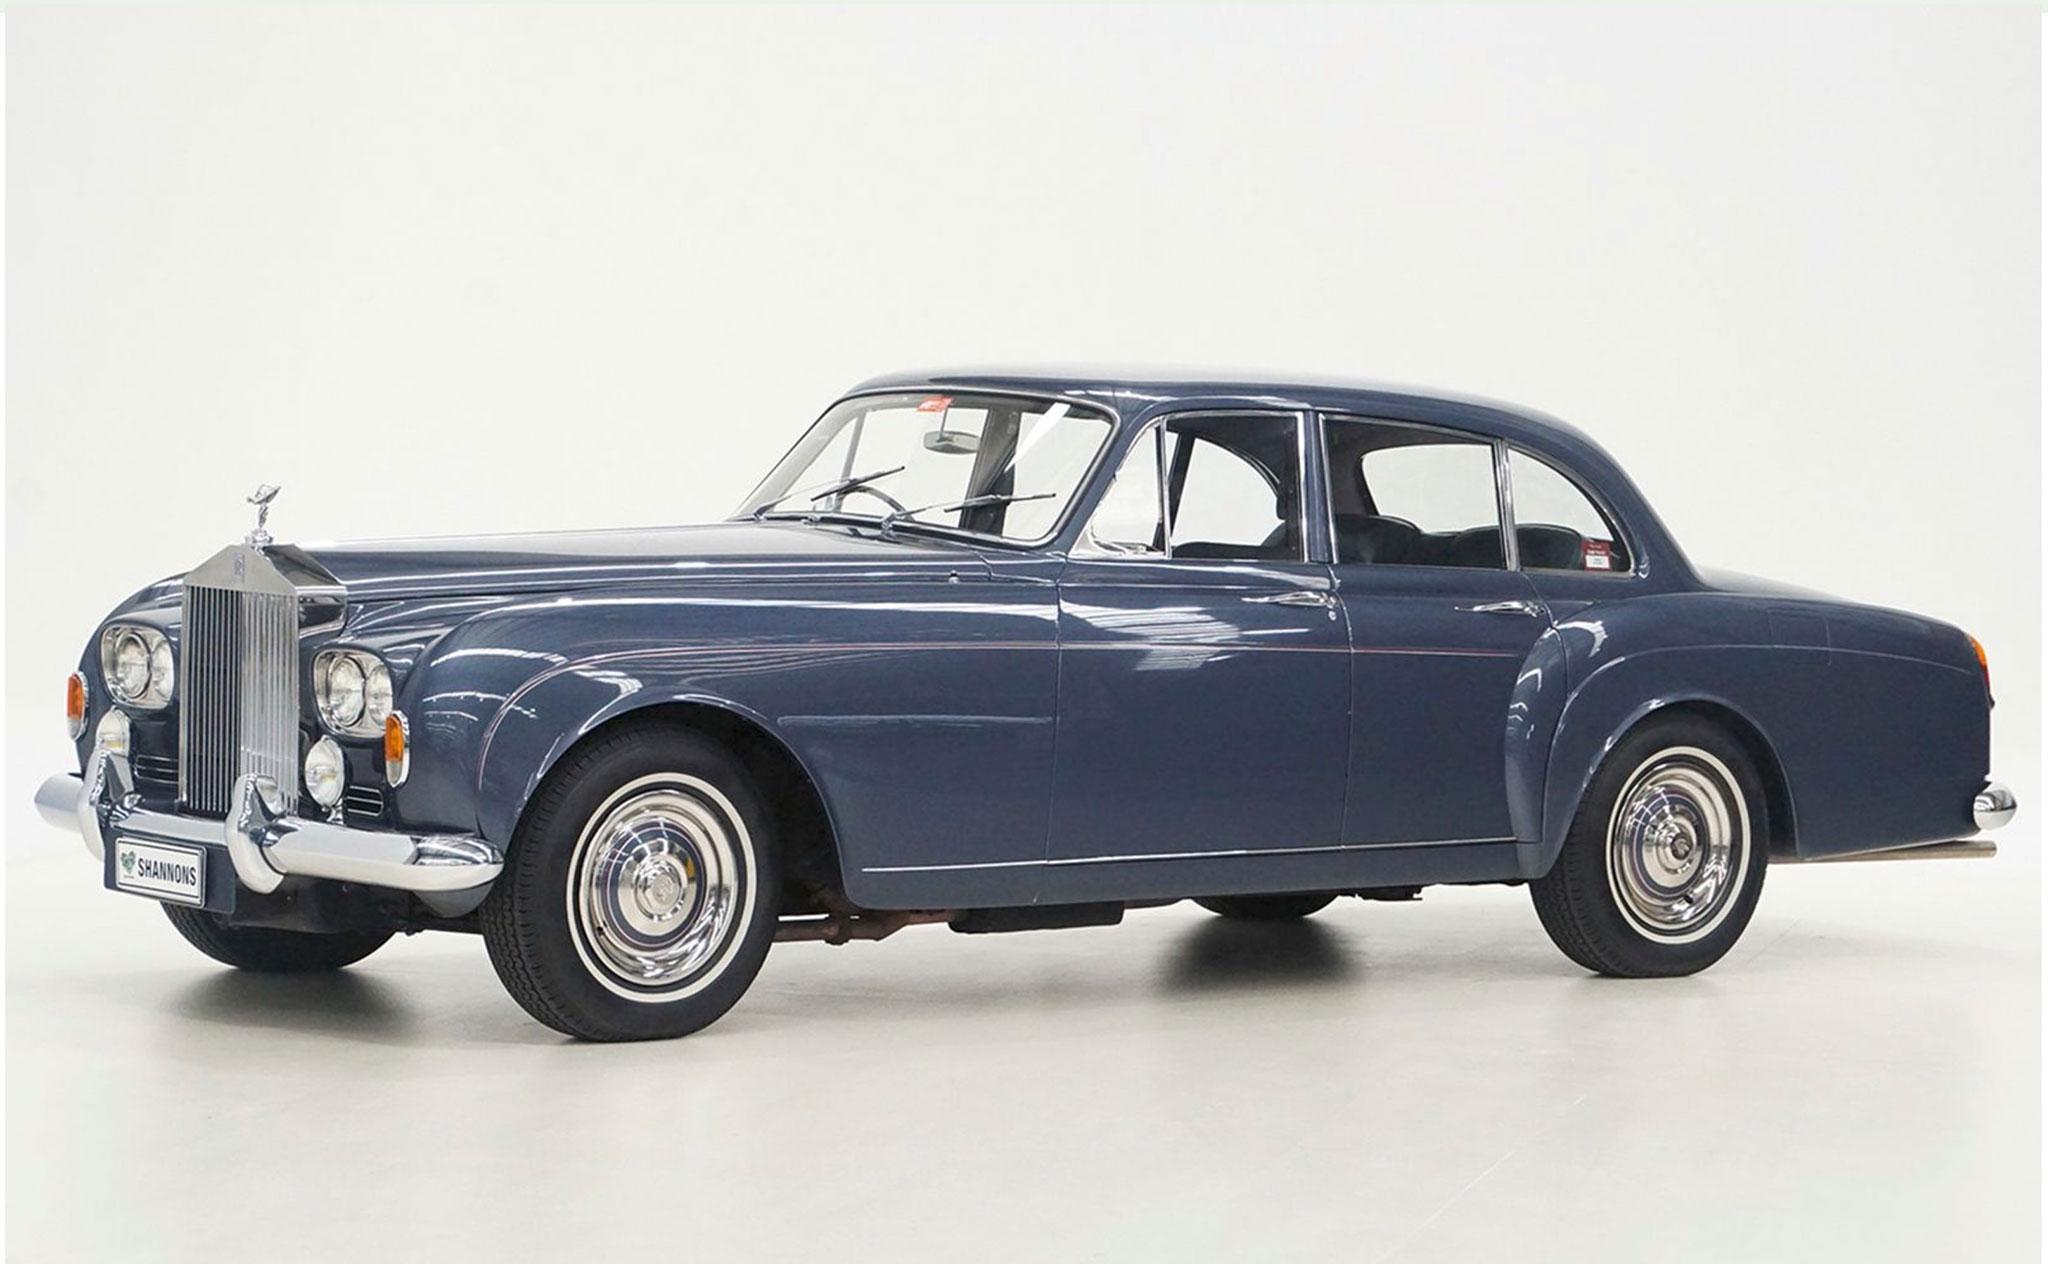 1965 Rolls-Royce Silver Cloud III Flying Spur Saloon Front - Les Anglaises à l'honneur.